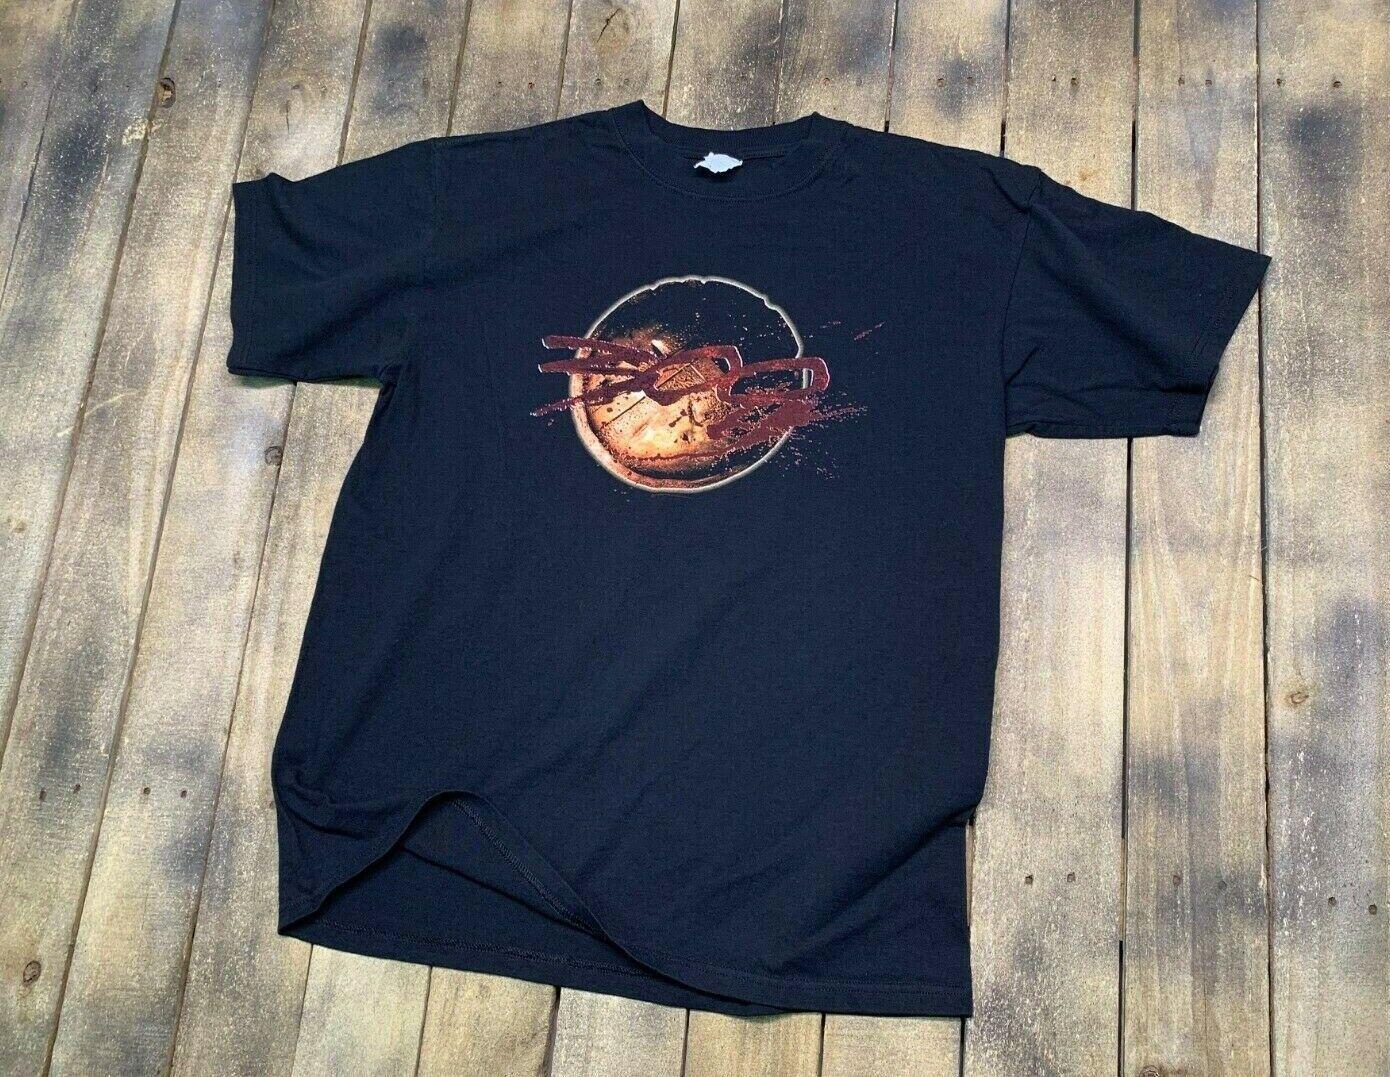 L * never worn 300 movie t shirt * vtg frank mill… - image 2